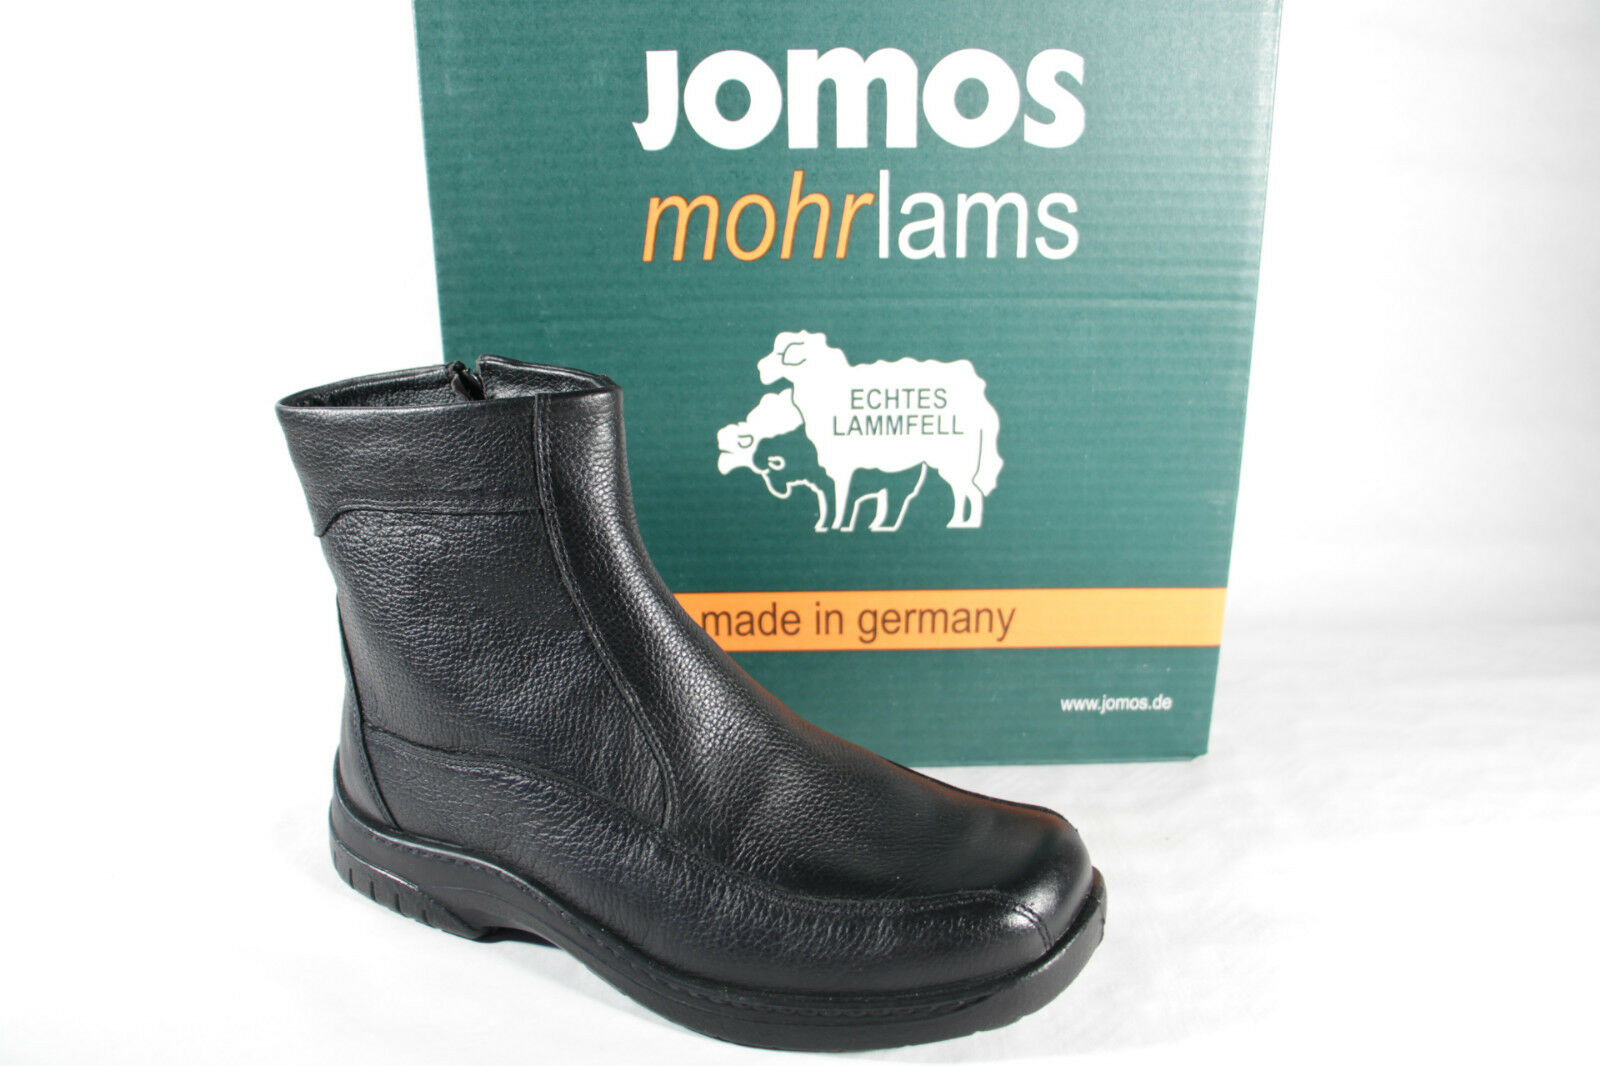 Jomos Men's Boots Winter Boots Black Leather Lambskin 406502 New